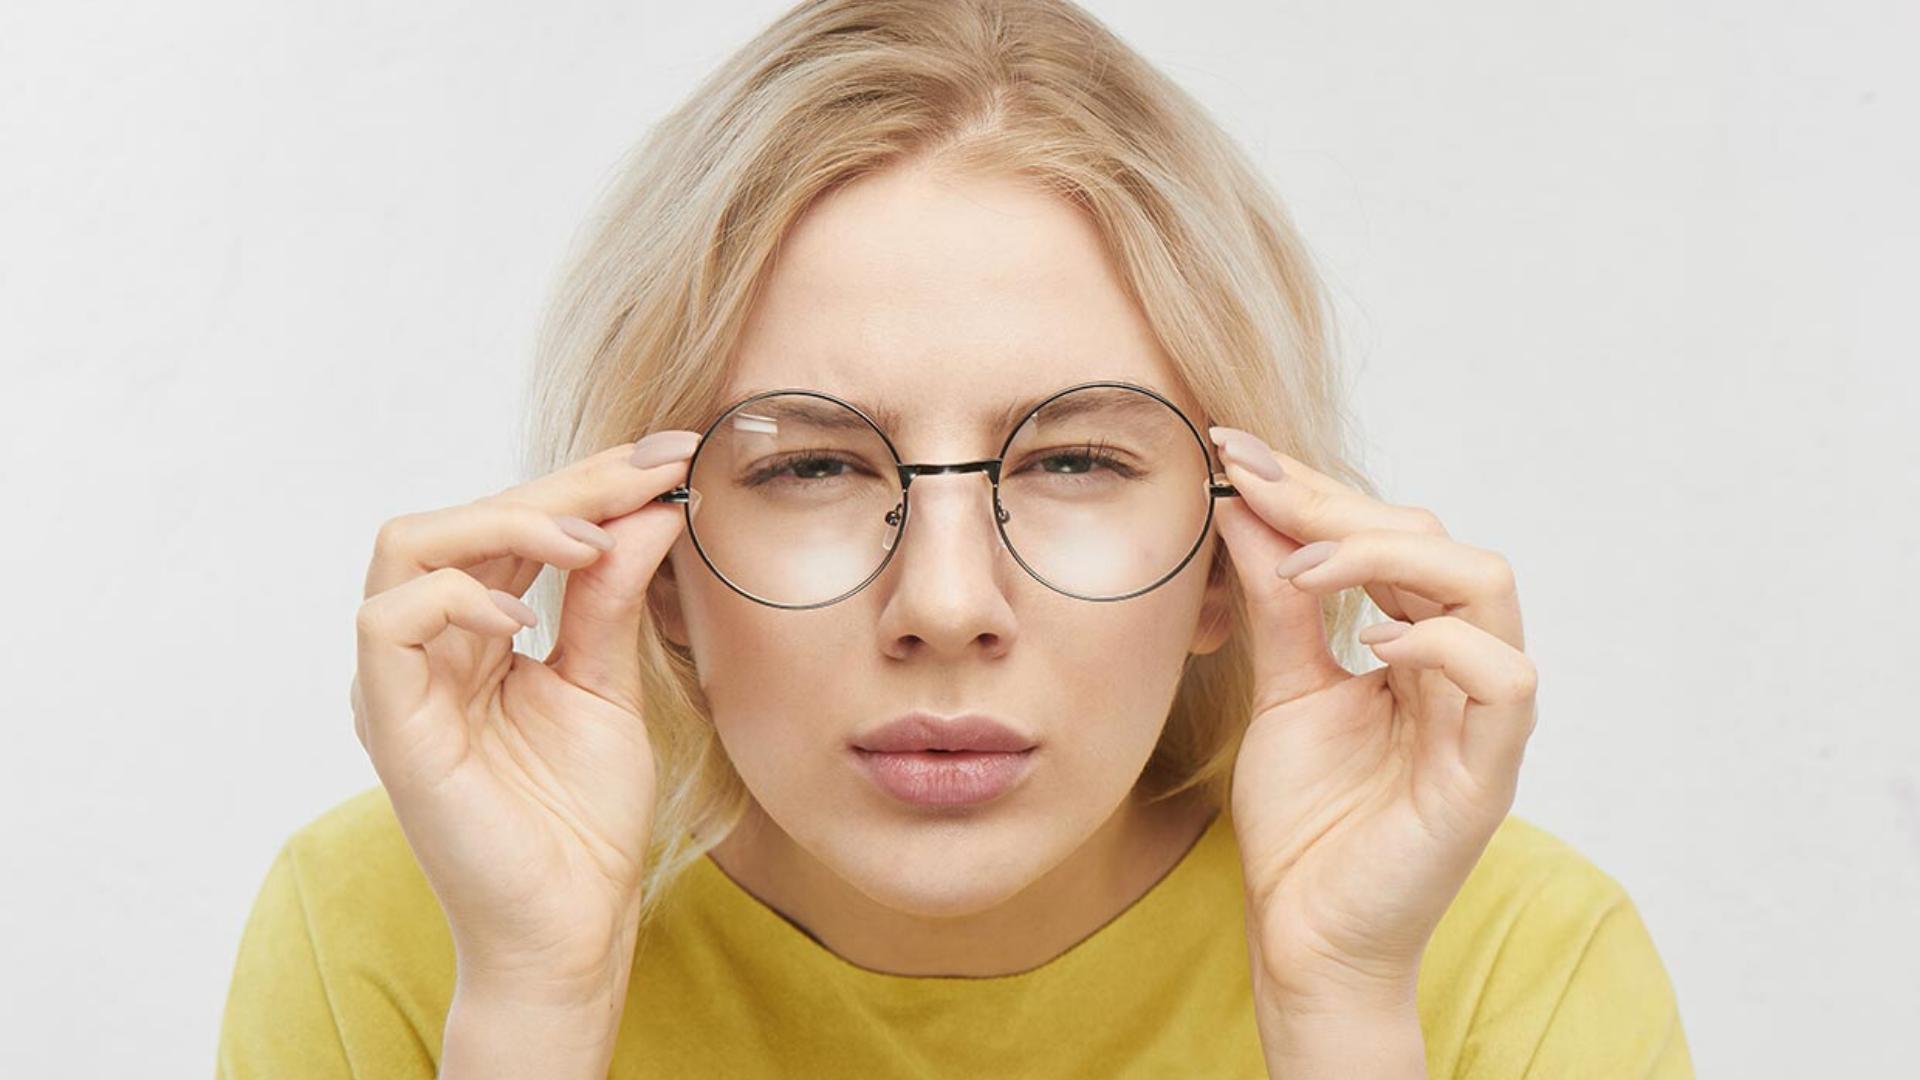 Cand este timpul sa iti inlocuiesti ochelarii?